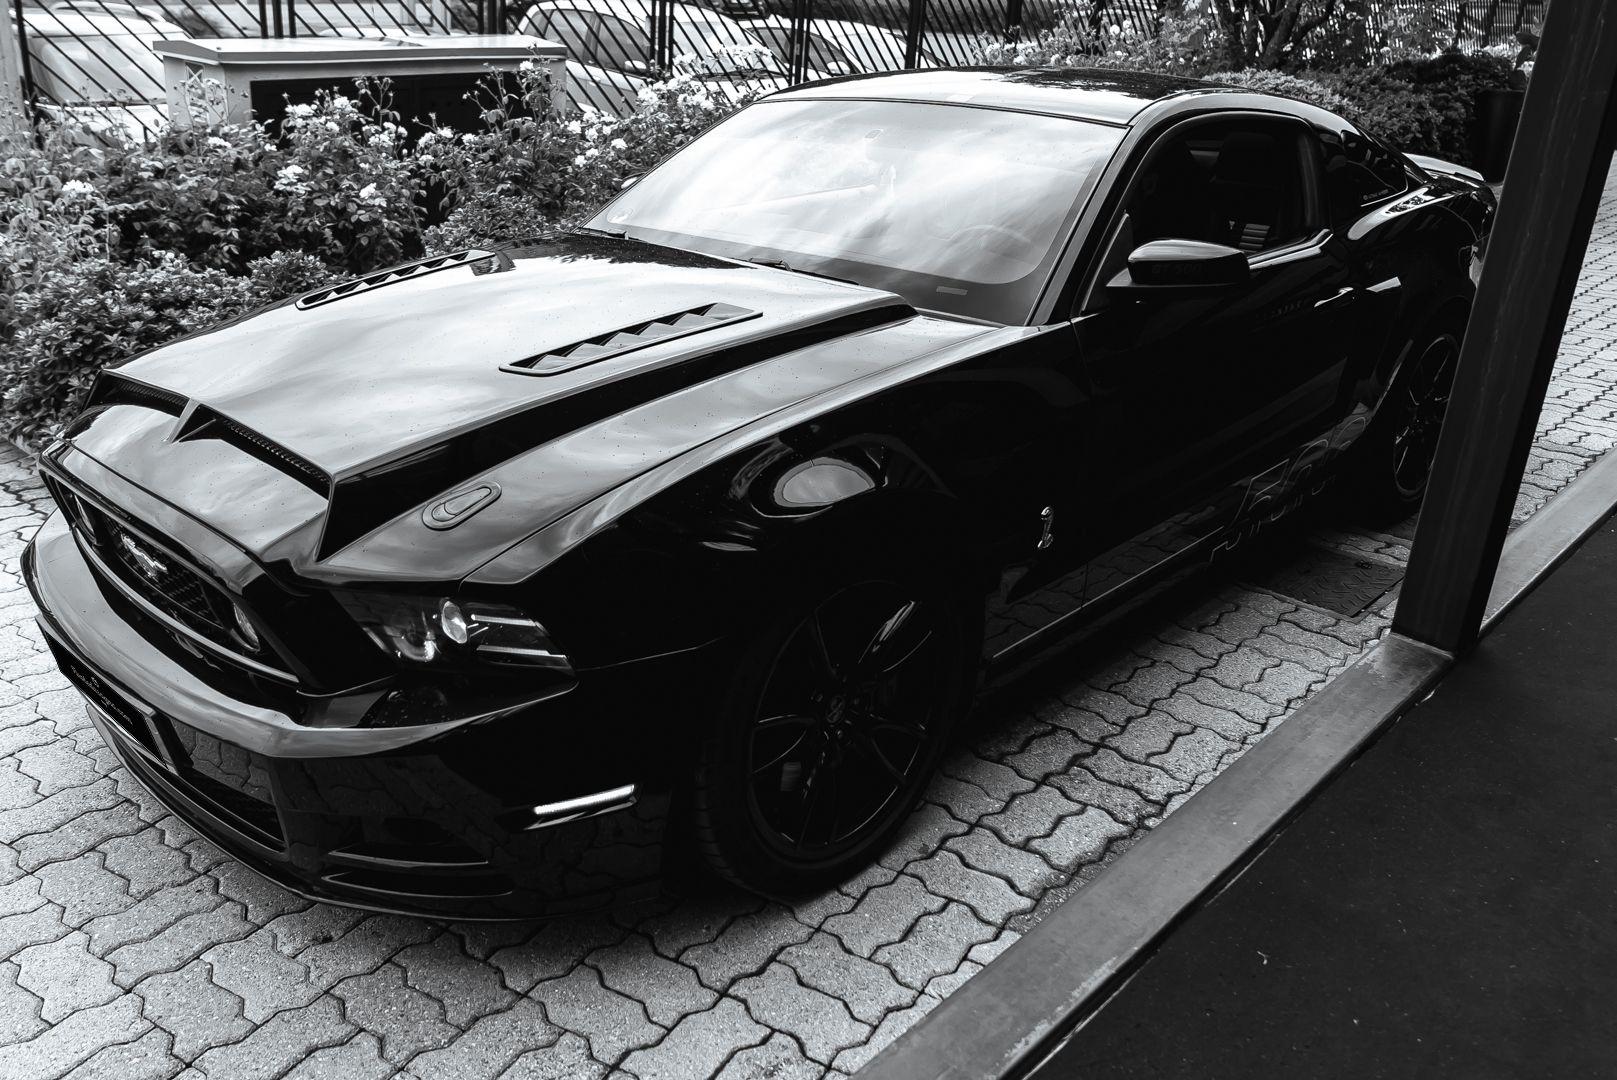 2012 Ford Mustang 5.0 V8 82054